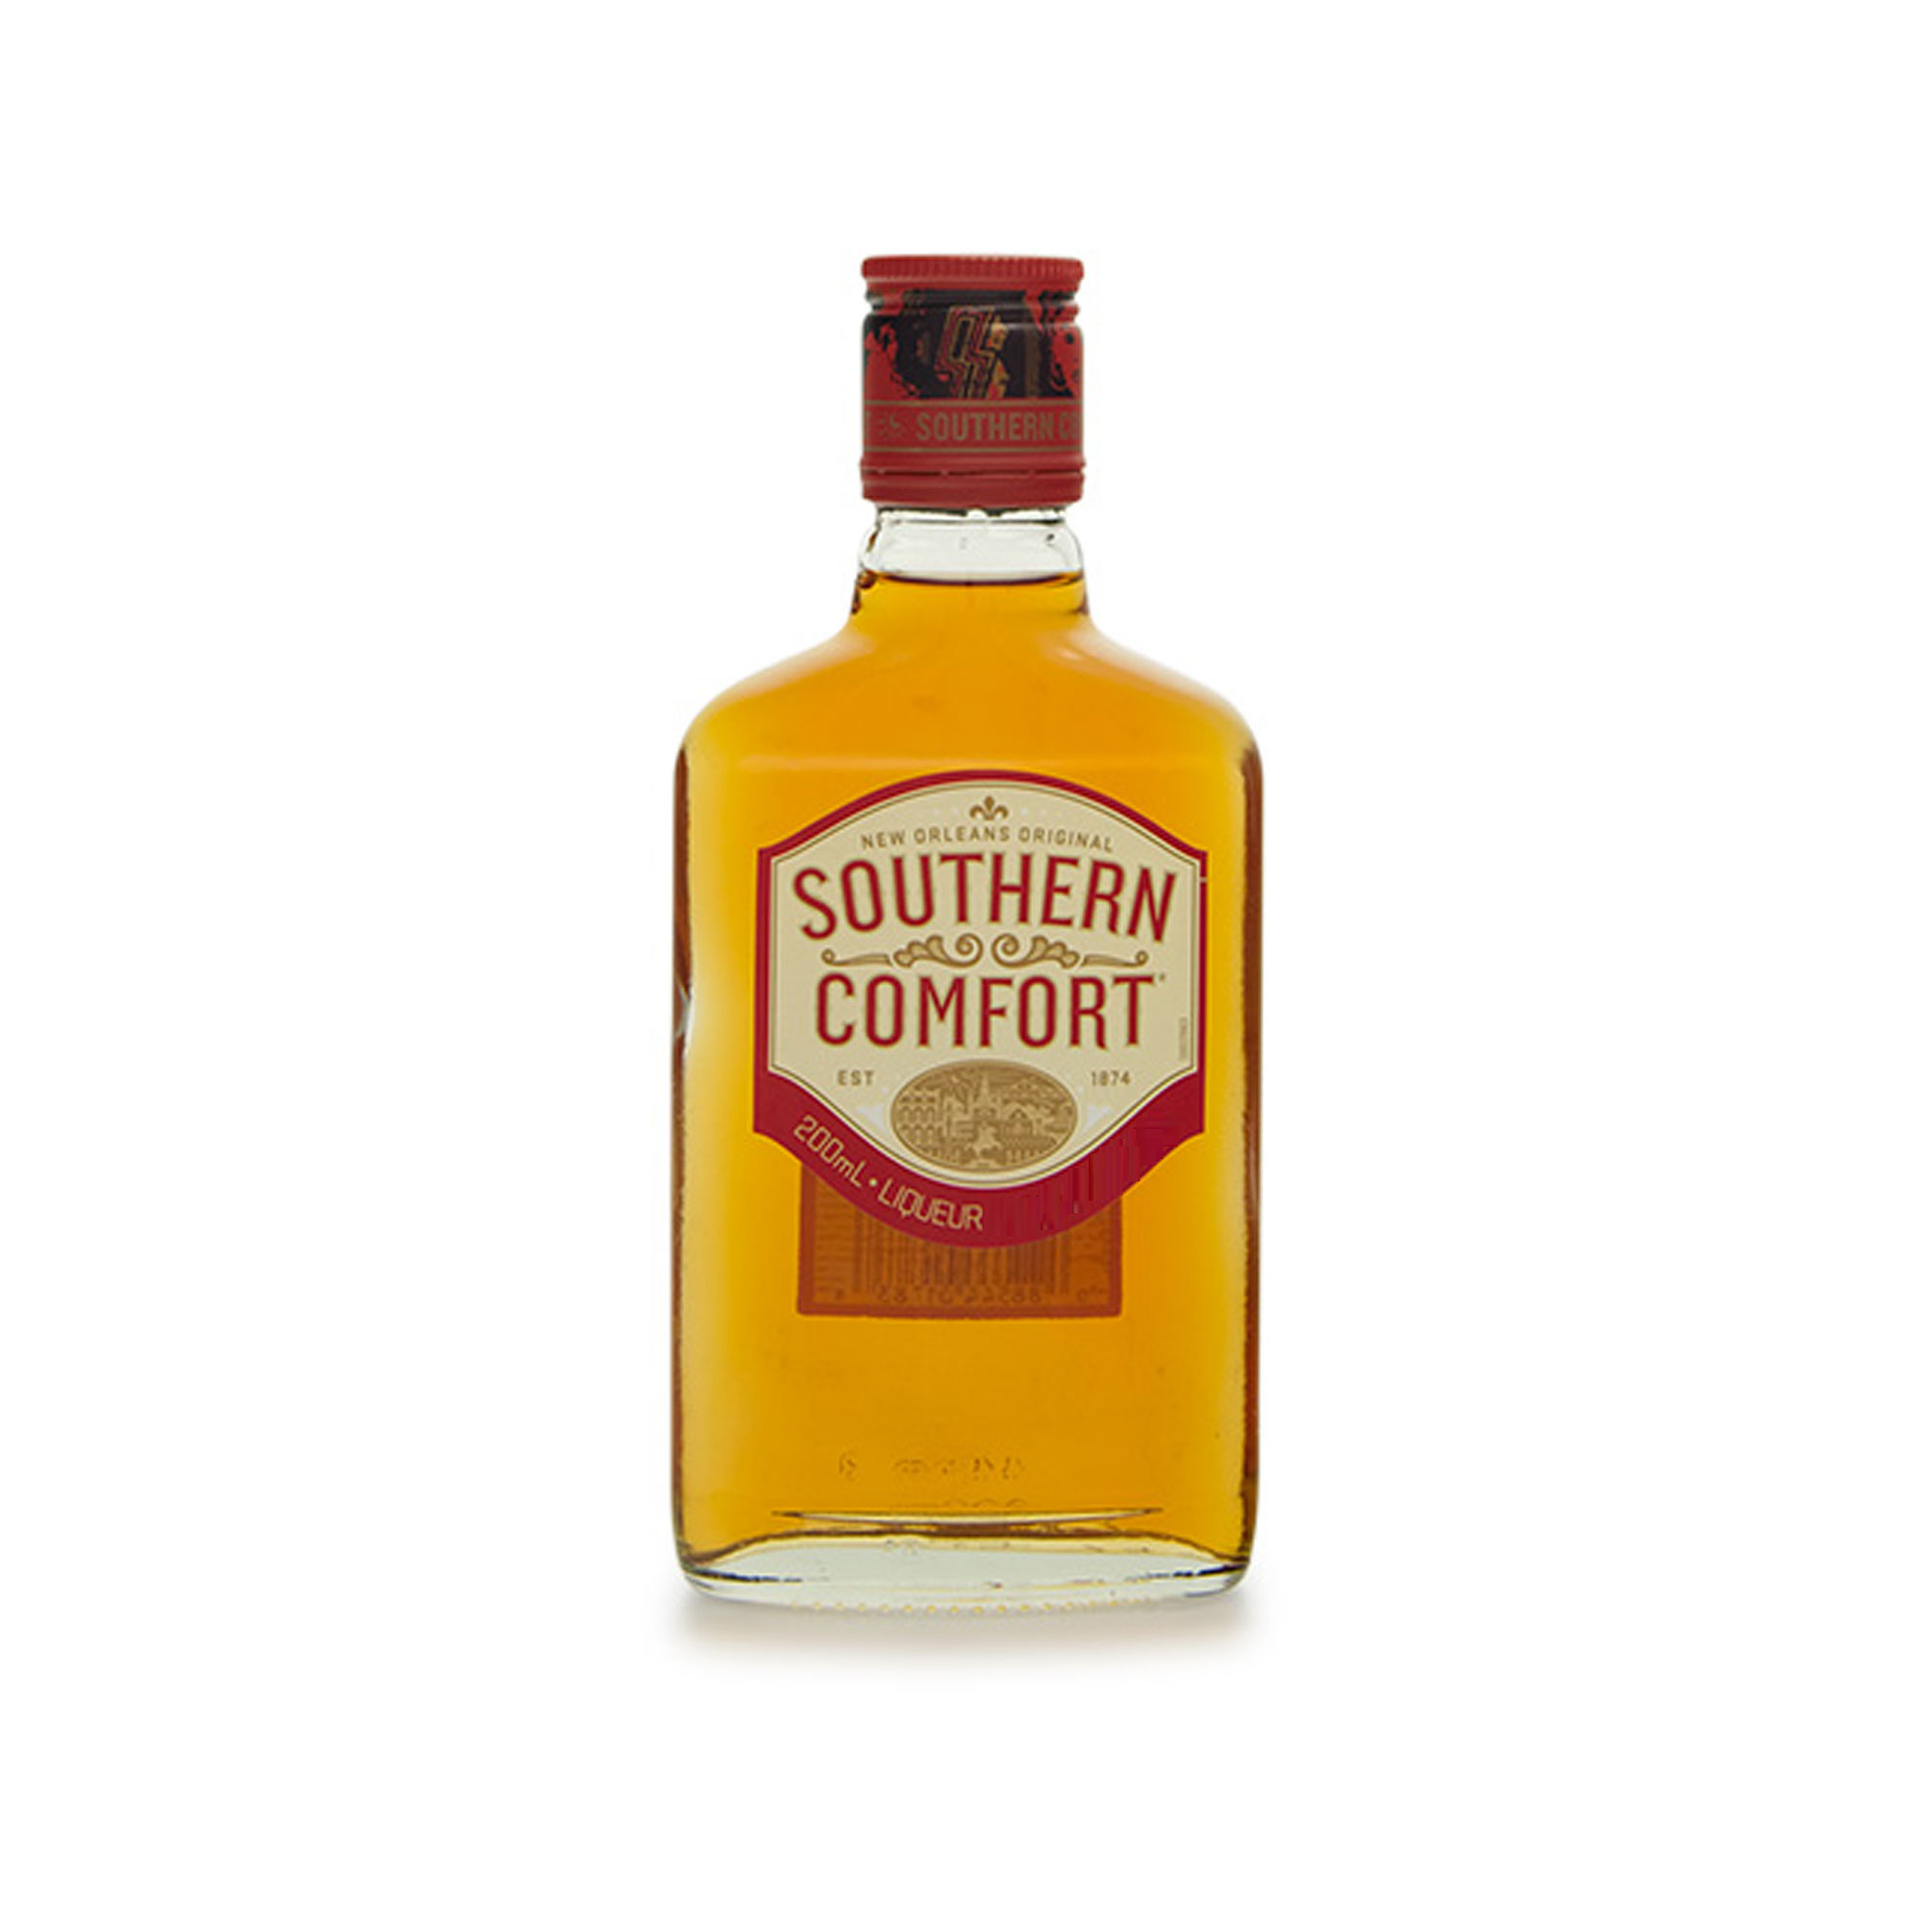 Southern Comfort Bourbon Value Cellars